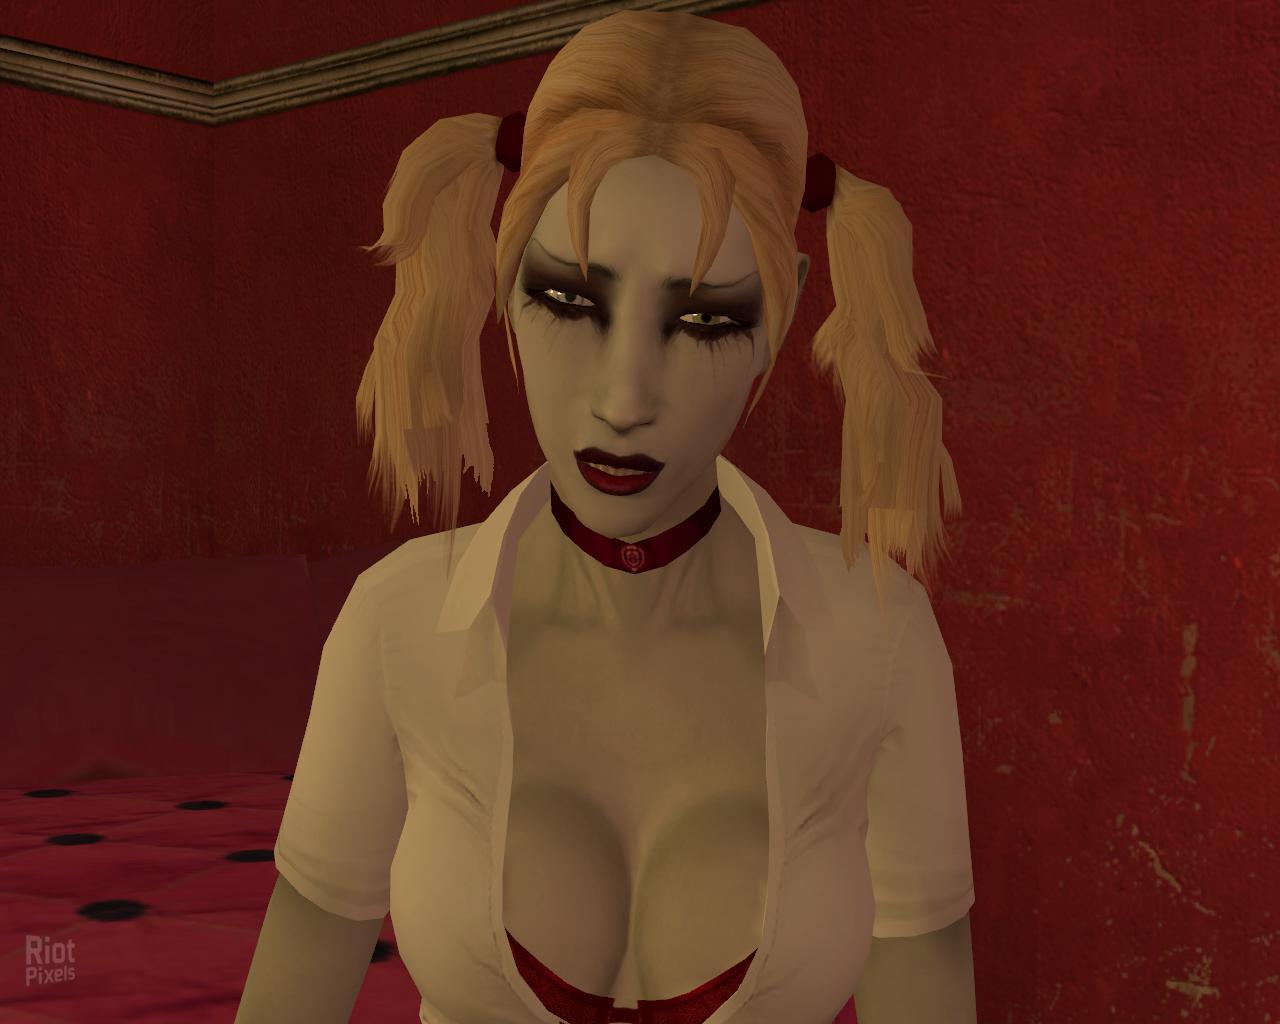 Vampire the masquerade sex mod porn films